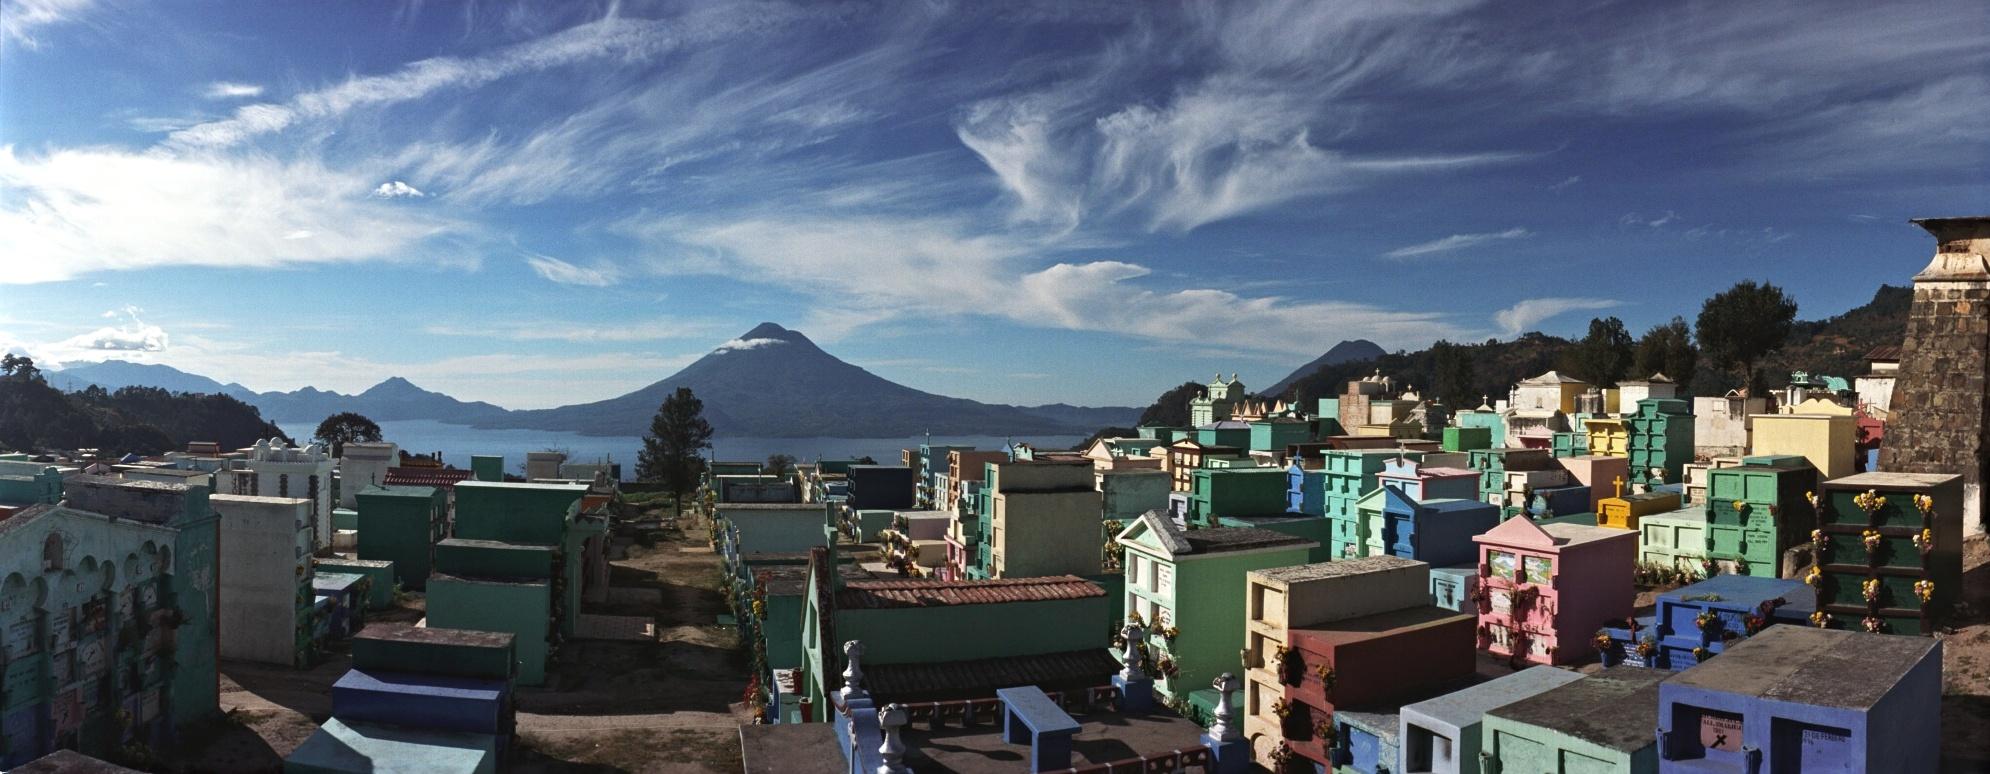 Guatemala-cemetery Solola